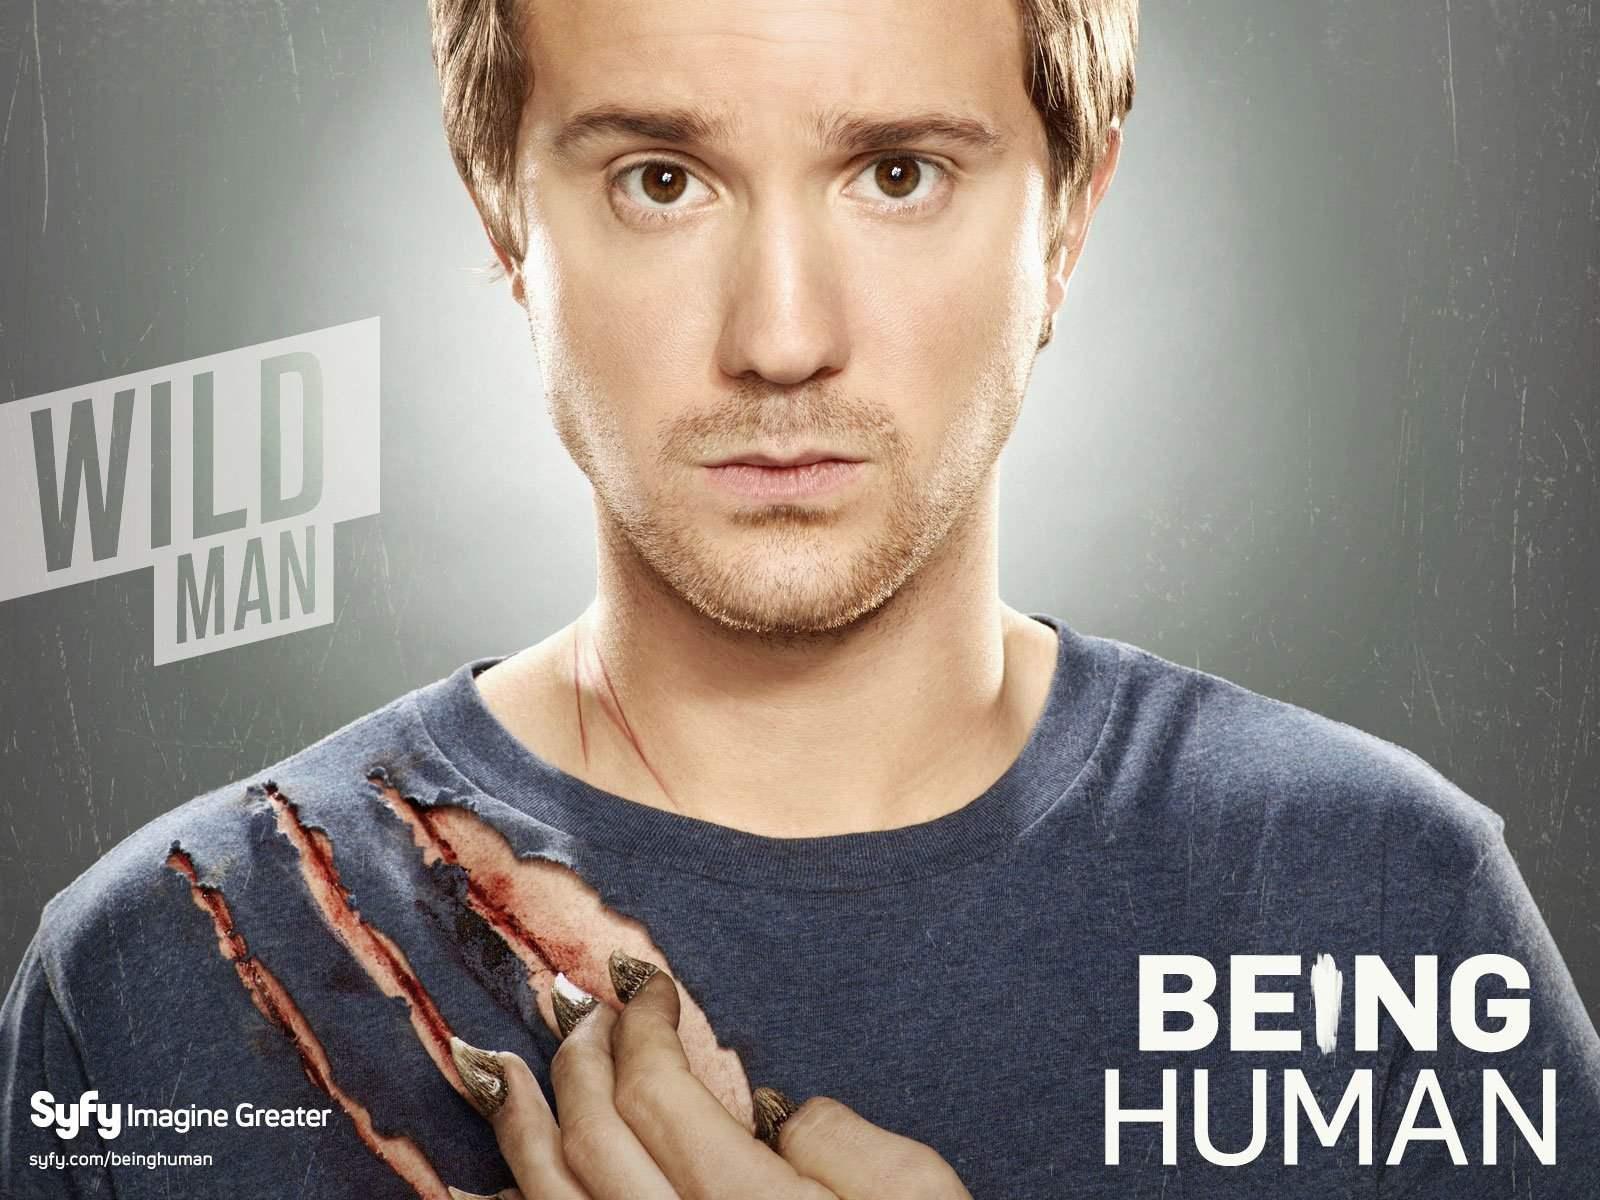 http://1.bp.blogspot.com/-cxHV82gOzLw/Tl68Ib5sIkI/AAAAAAAACy0/c9iaKxekp00/s1600/Being_Human_HD_Wallpaper_www.Vvallpaper.Net_2.jpg